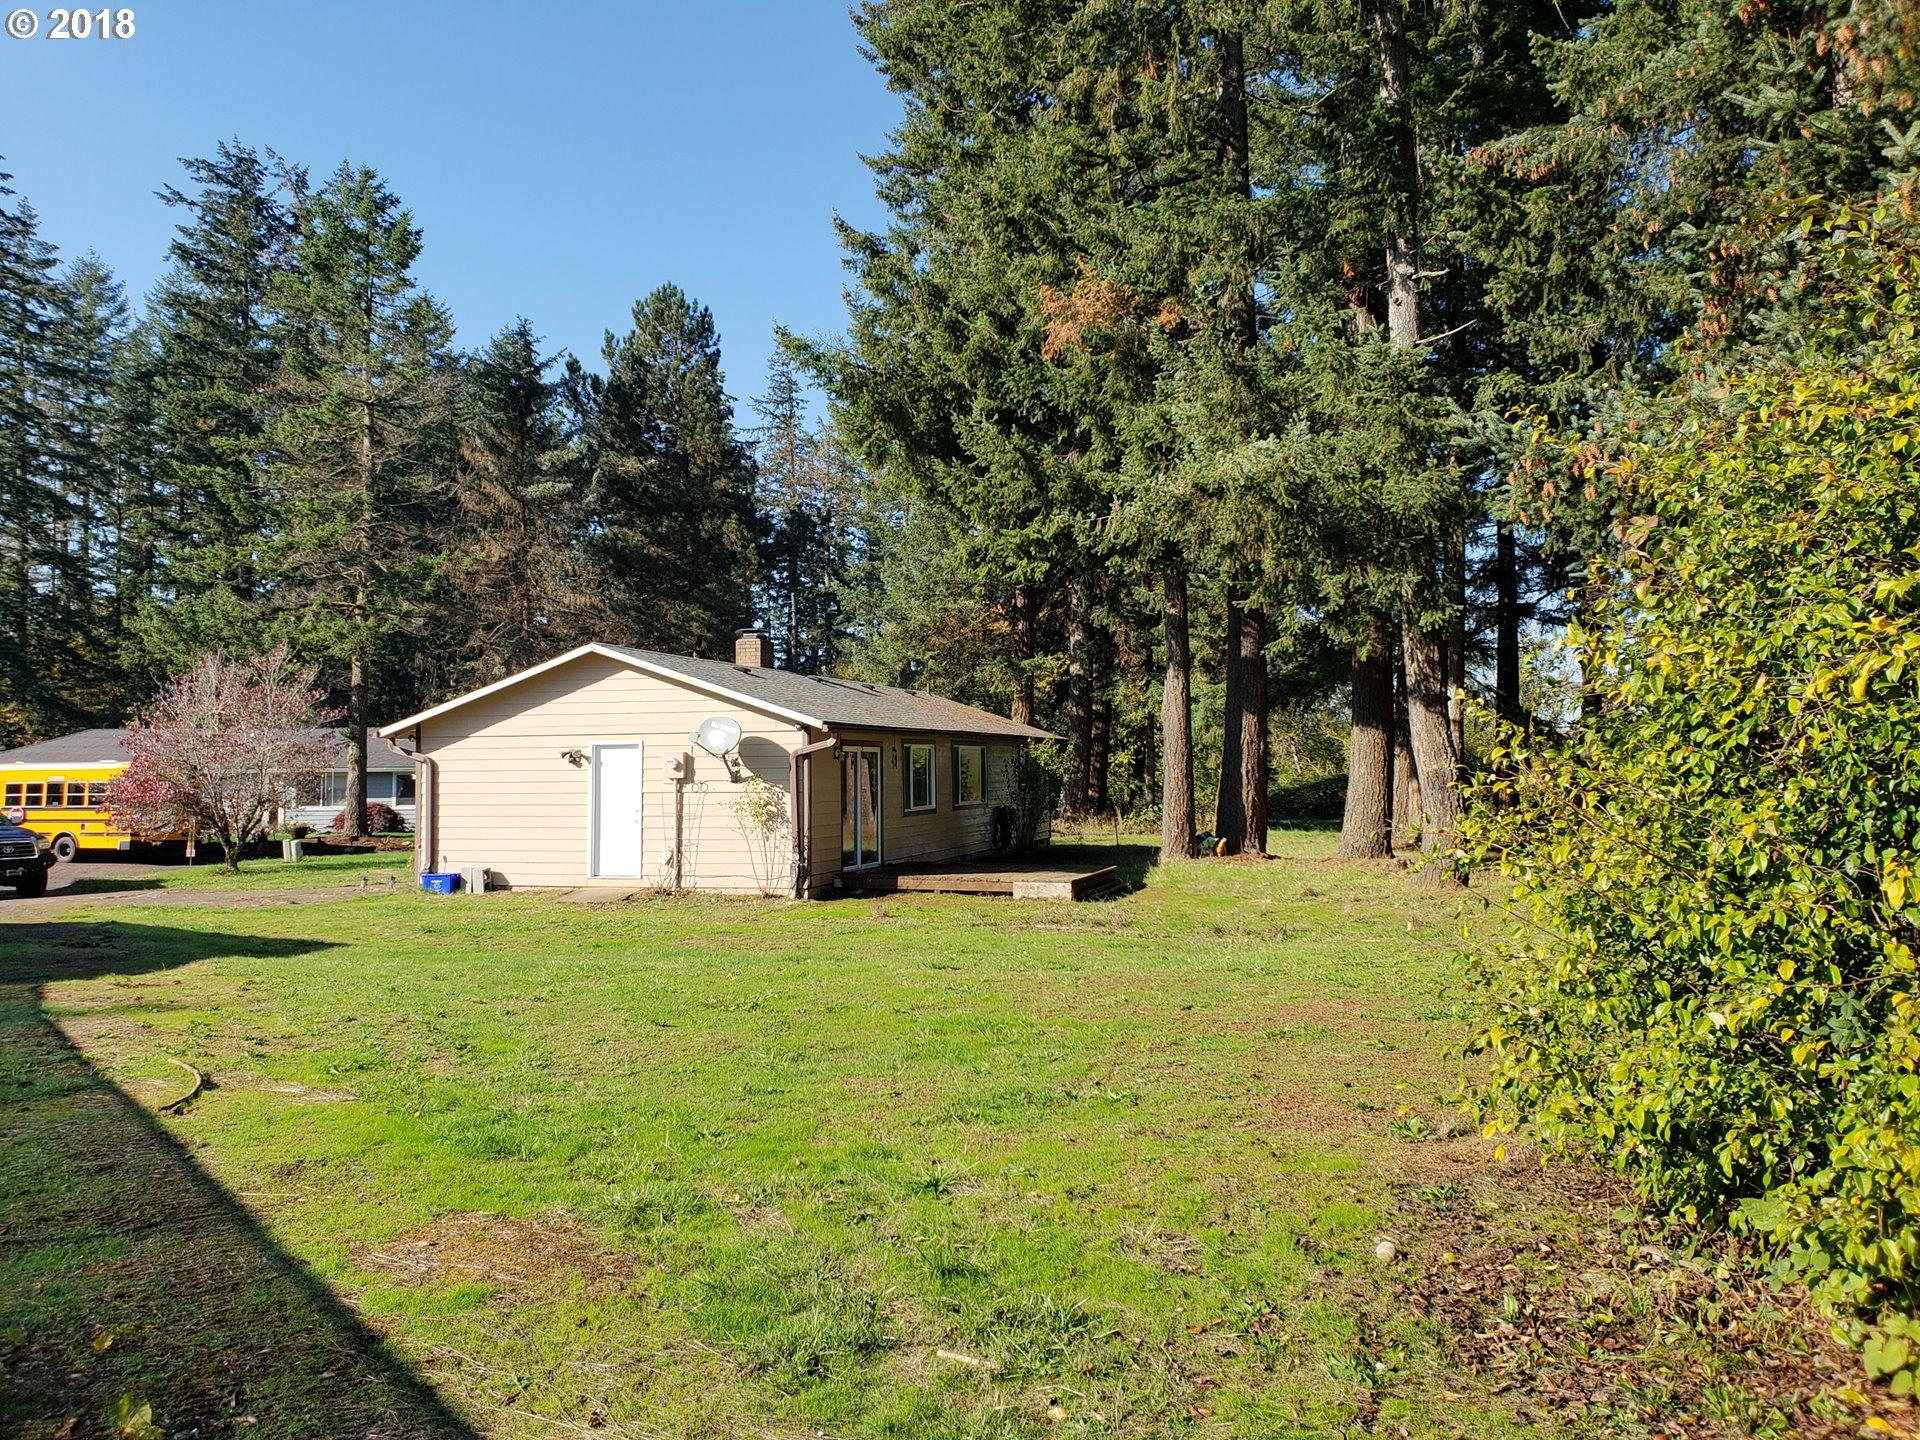 17910 S FIR CONE CT Oregon City, OR 97045 - MLS #: 18572808